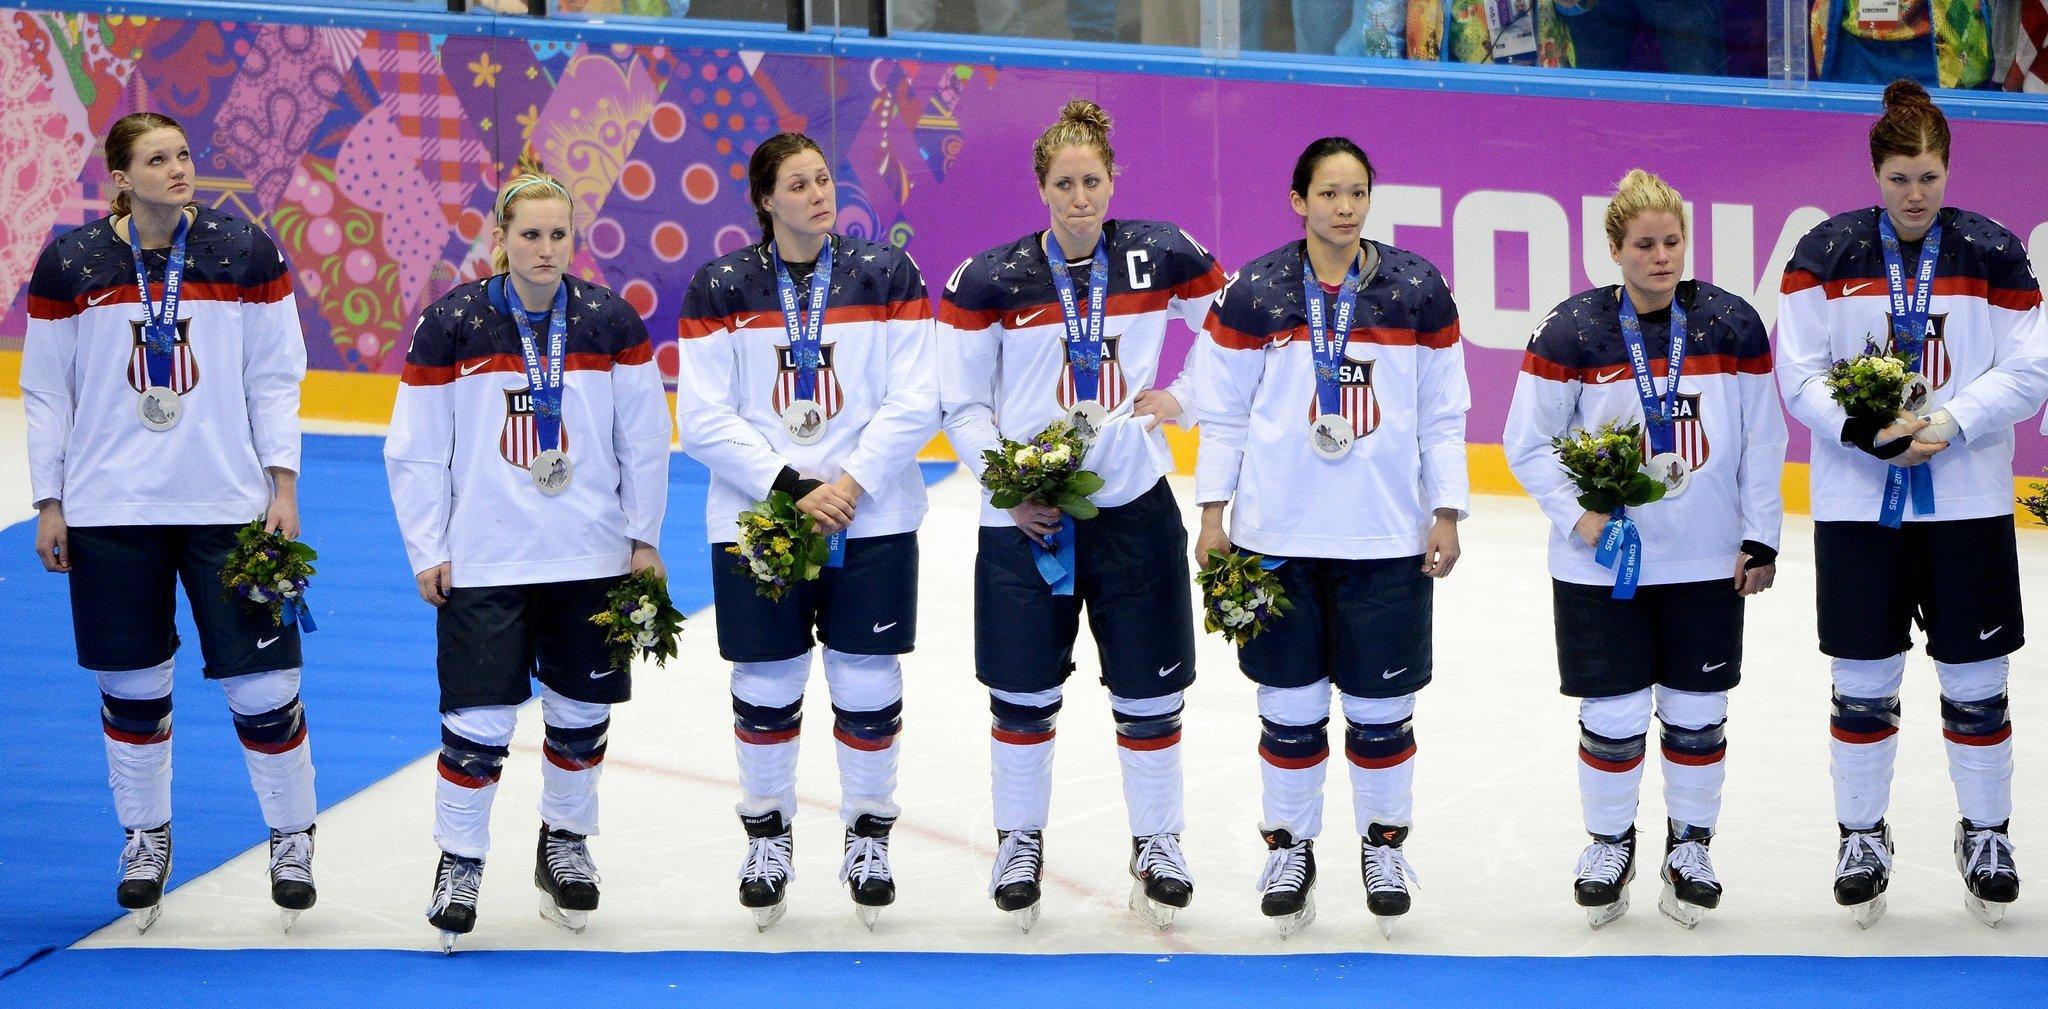 Wage dispute involving US women's hockey team escalating